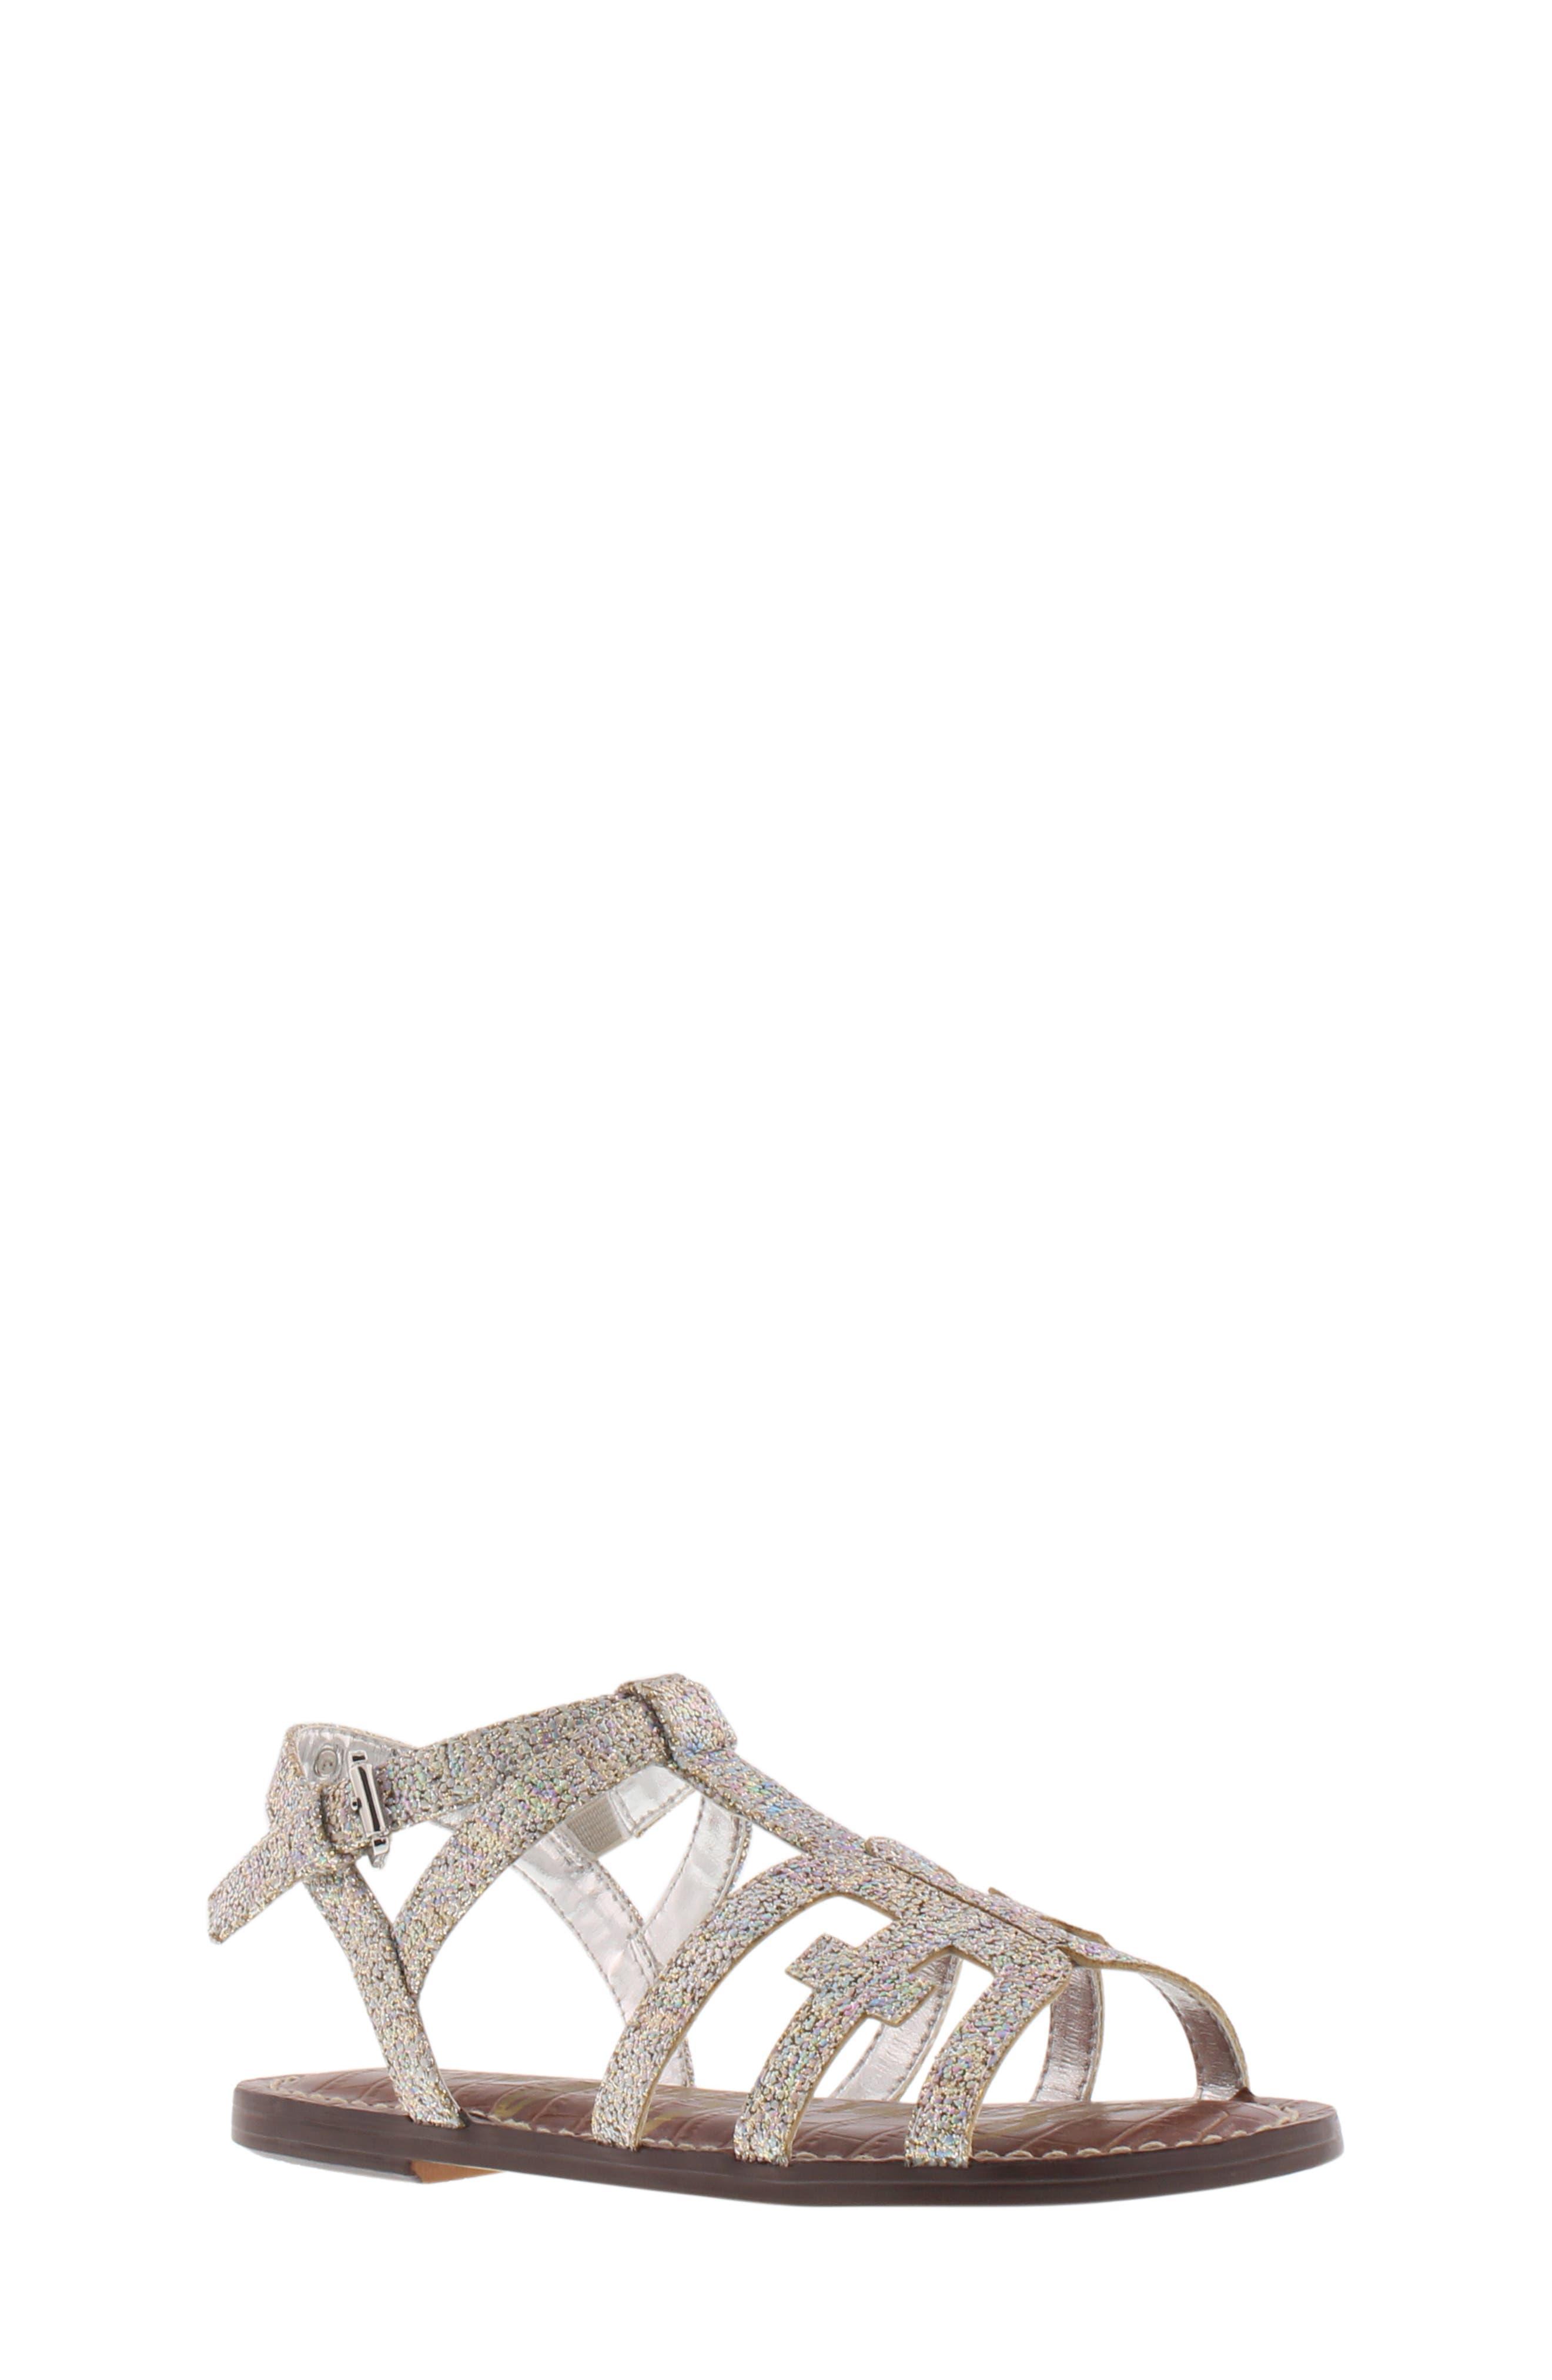 Girls Sam Edelman Gigi Cara Glitter Sandal Size 3 M  Metallic